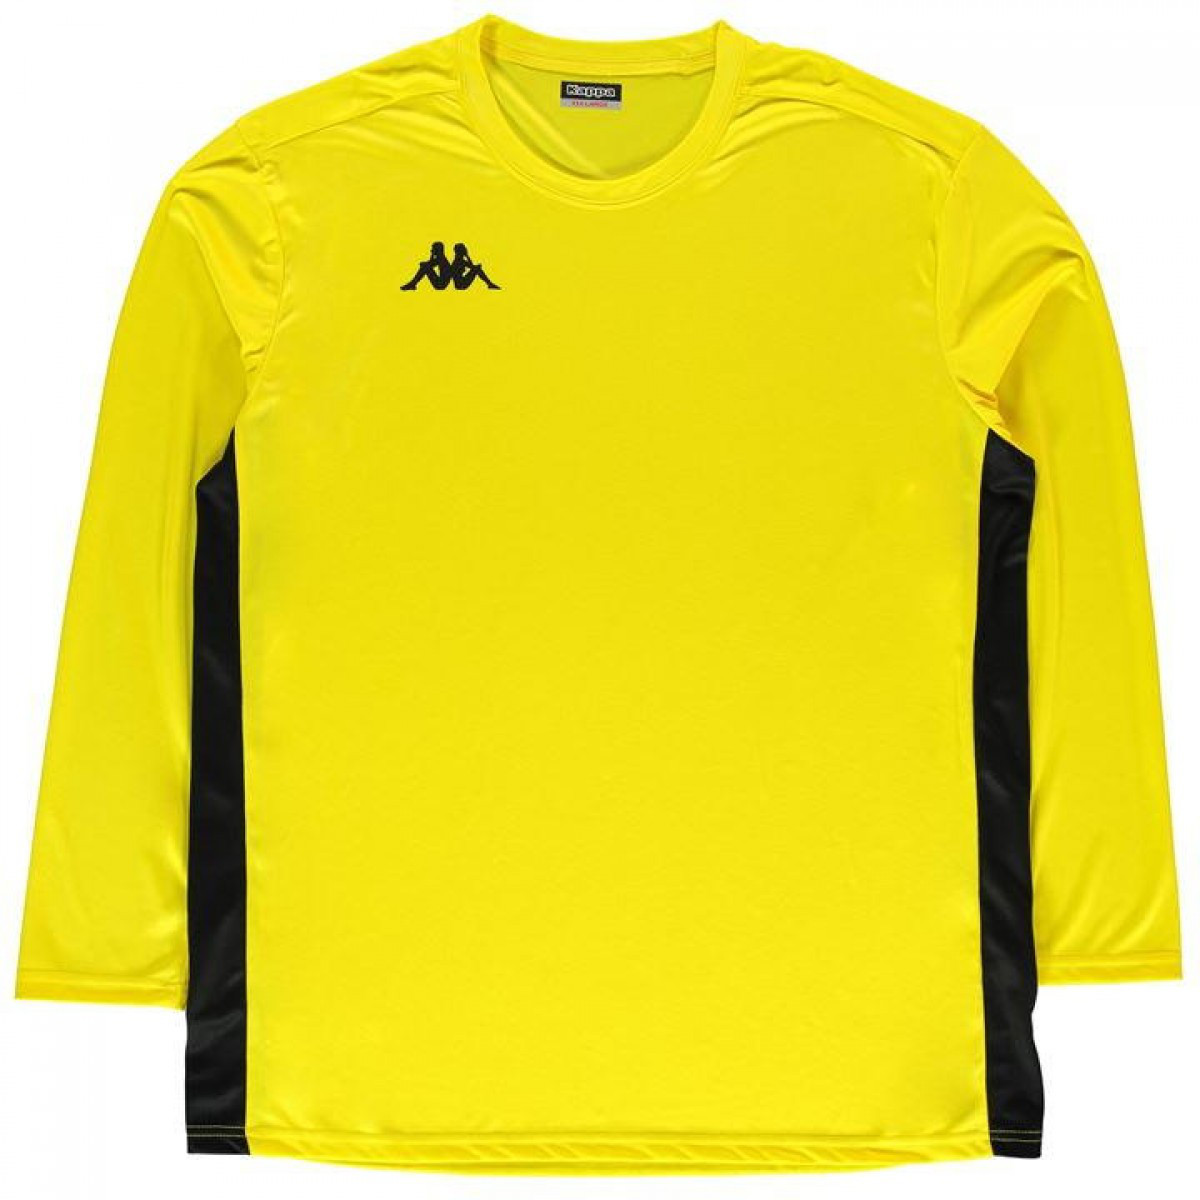 7974c35ff0b8 Футболка Kappa Torino Long Sleeve Yellow Royal - Оригинал — в ...